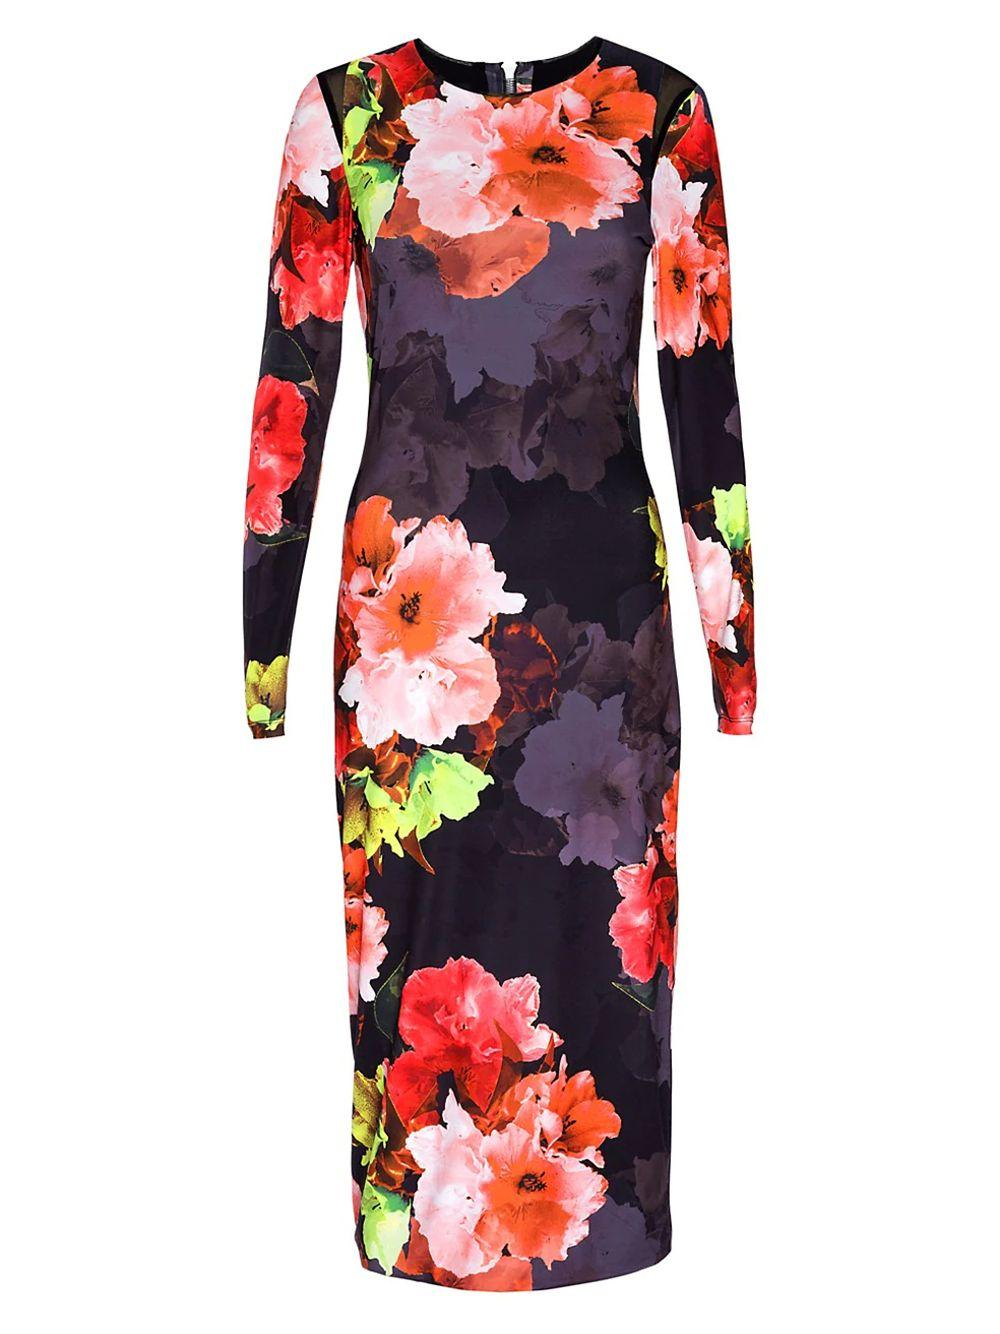 Kate Floral Mesh Midi Dress Item # 3030PH-FW21